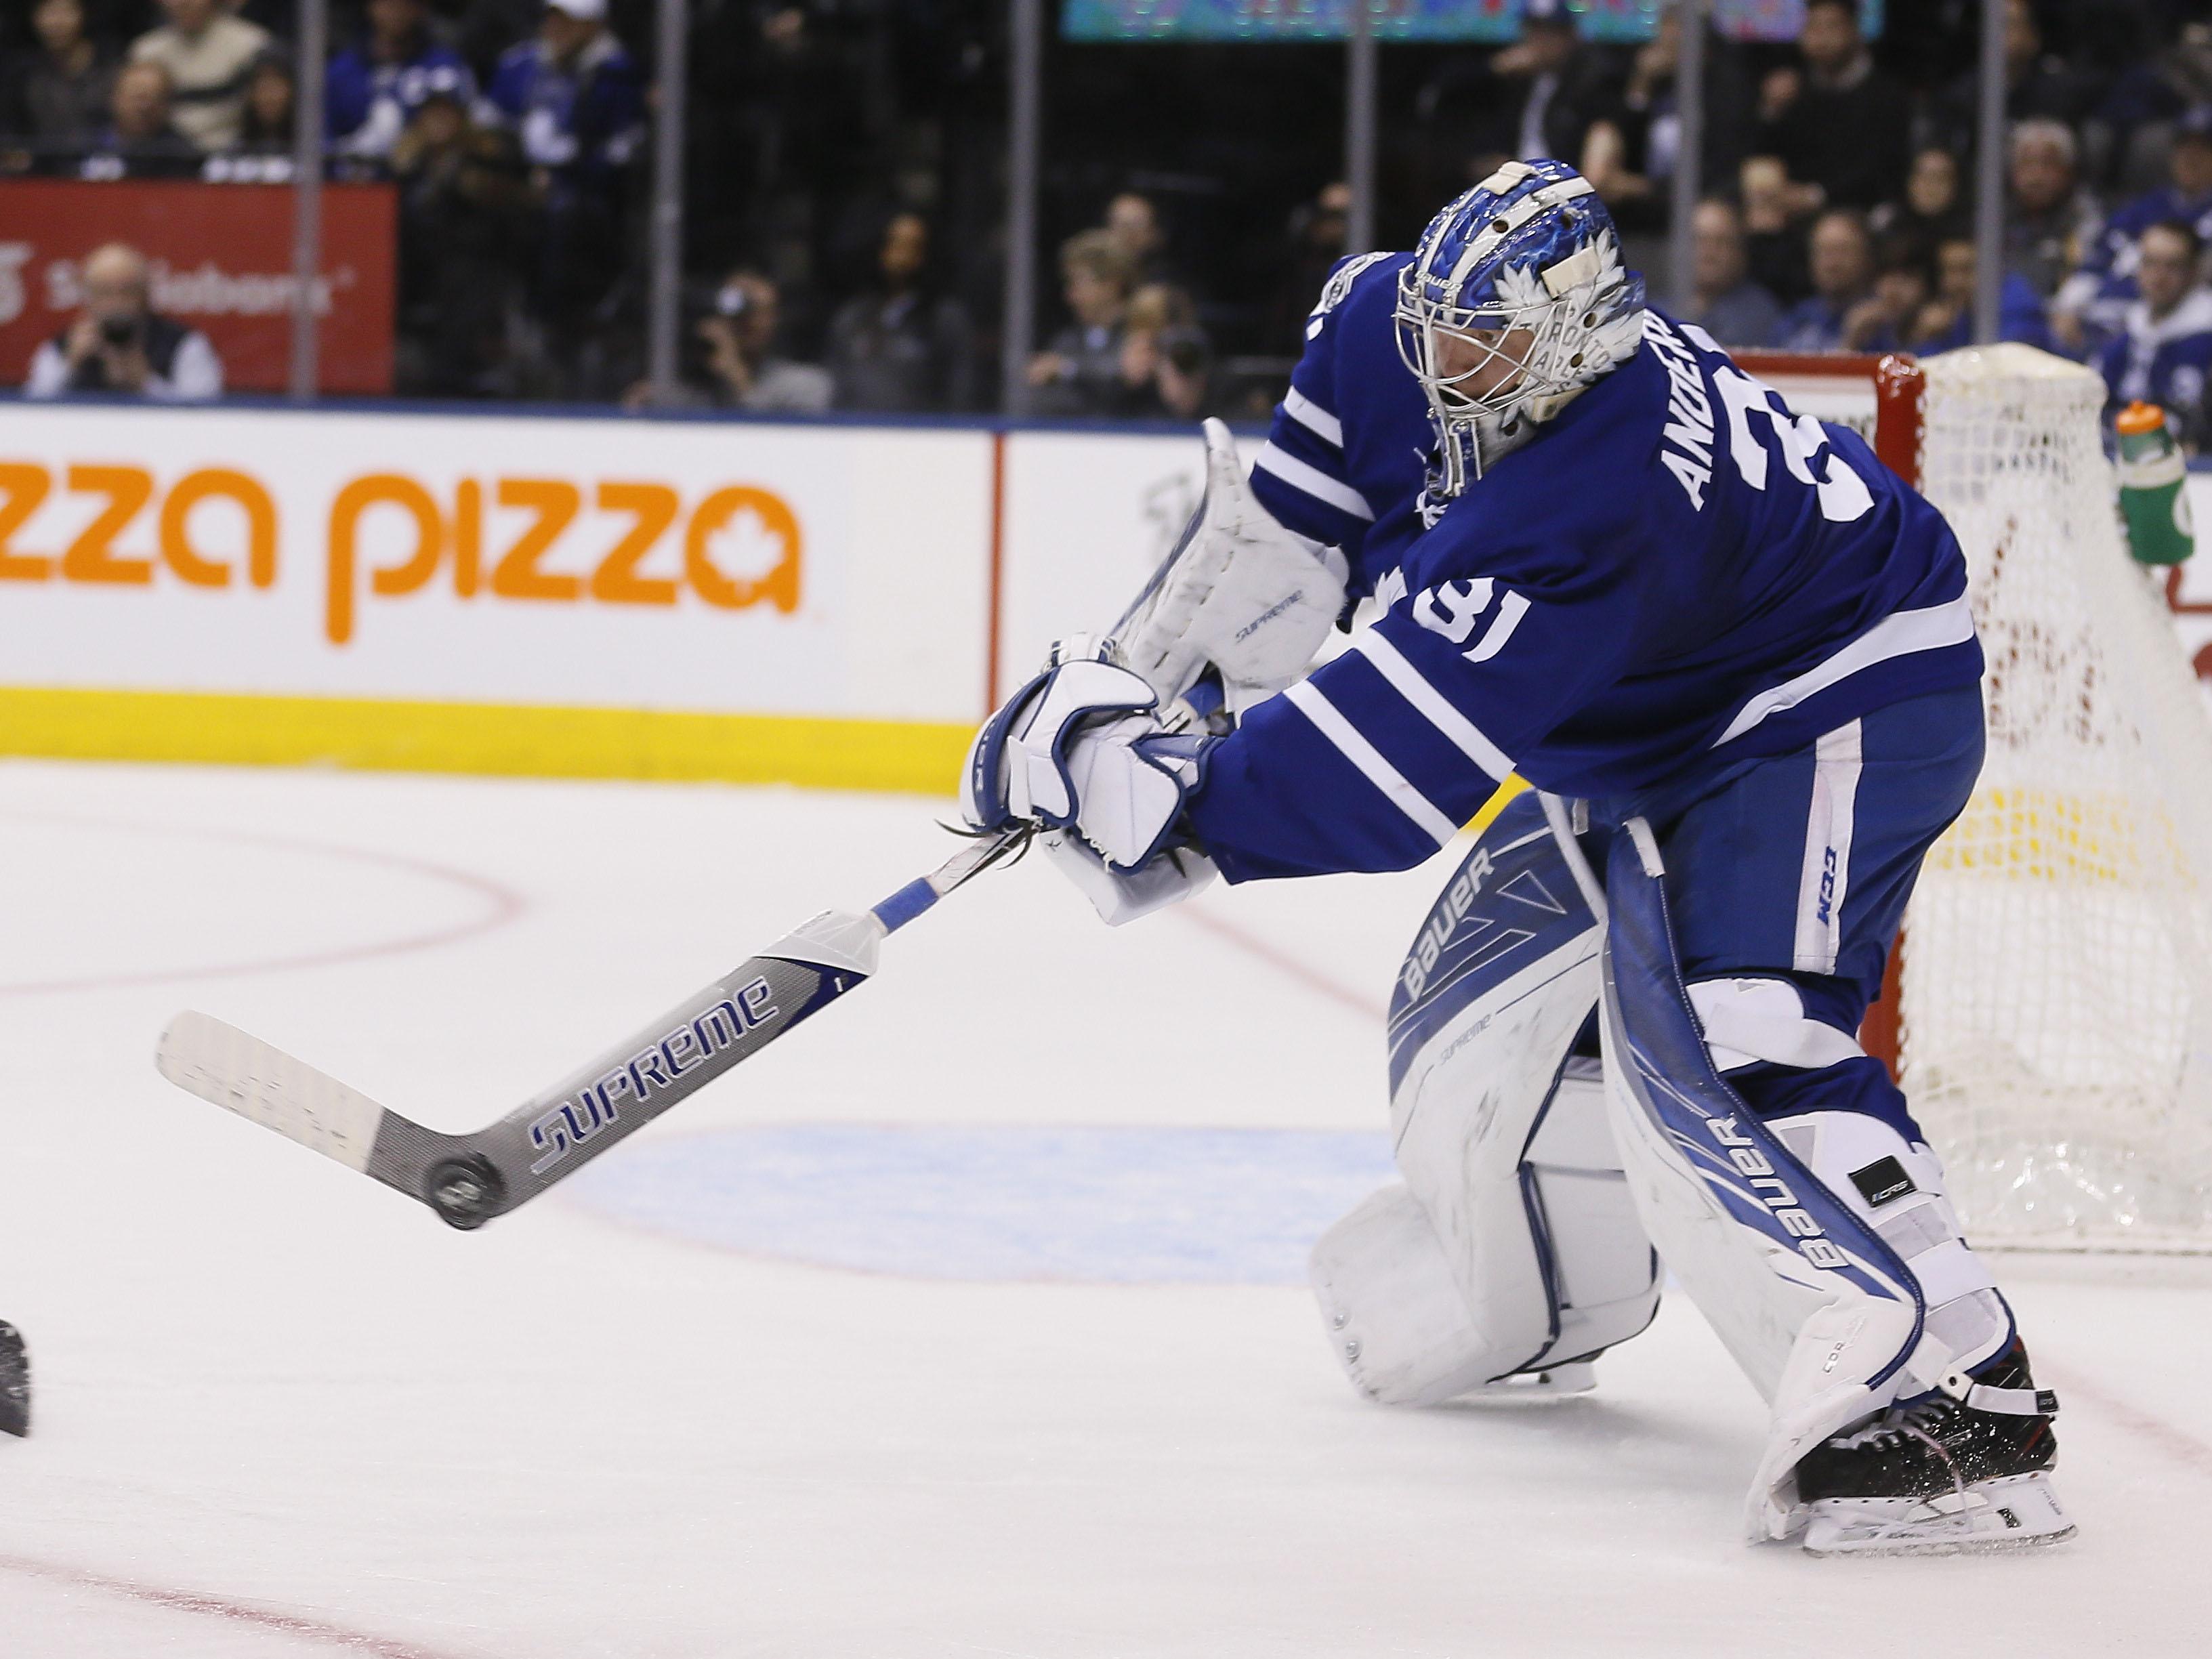 NHL: Buffalo Sabres at Toronto Maple Leafs